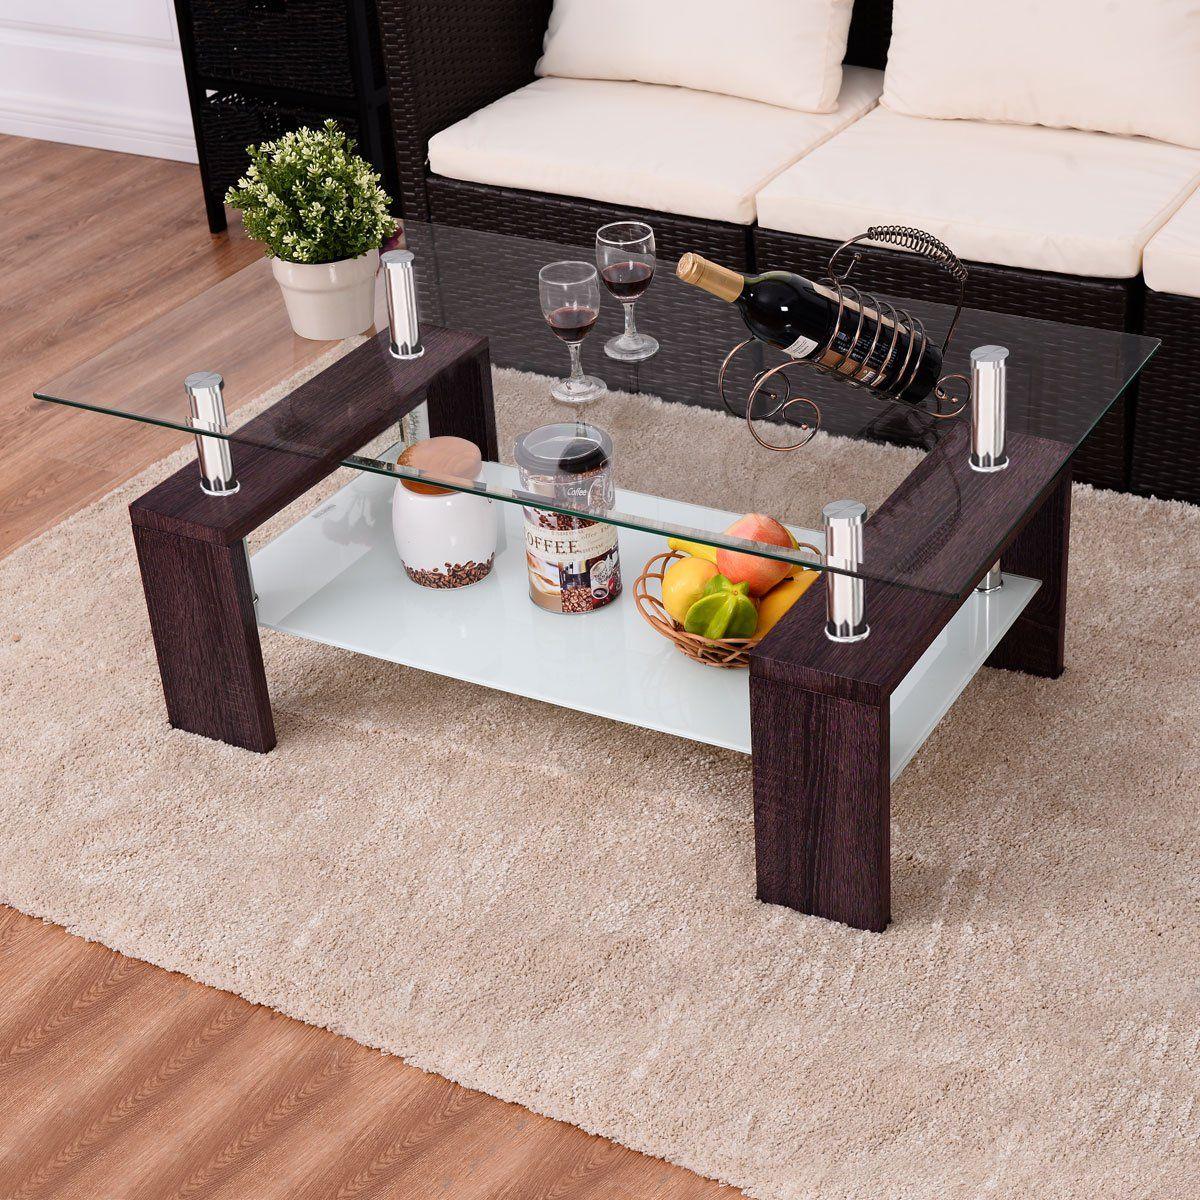 Tangkula Rectangular Glass Coffee Table Shelf Living Room Furniture New Brown Det Coffee Table With Shelf Rectangular Glass Coffee Table Glass Coffee Table [ 1200 x 1200 Pixel ]